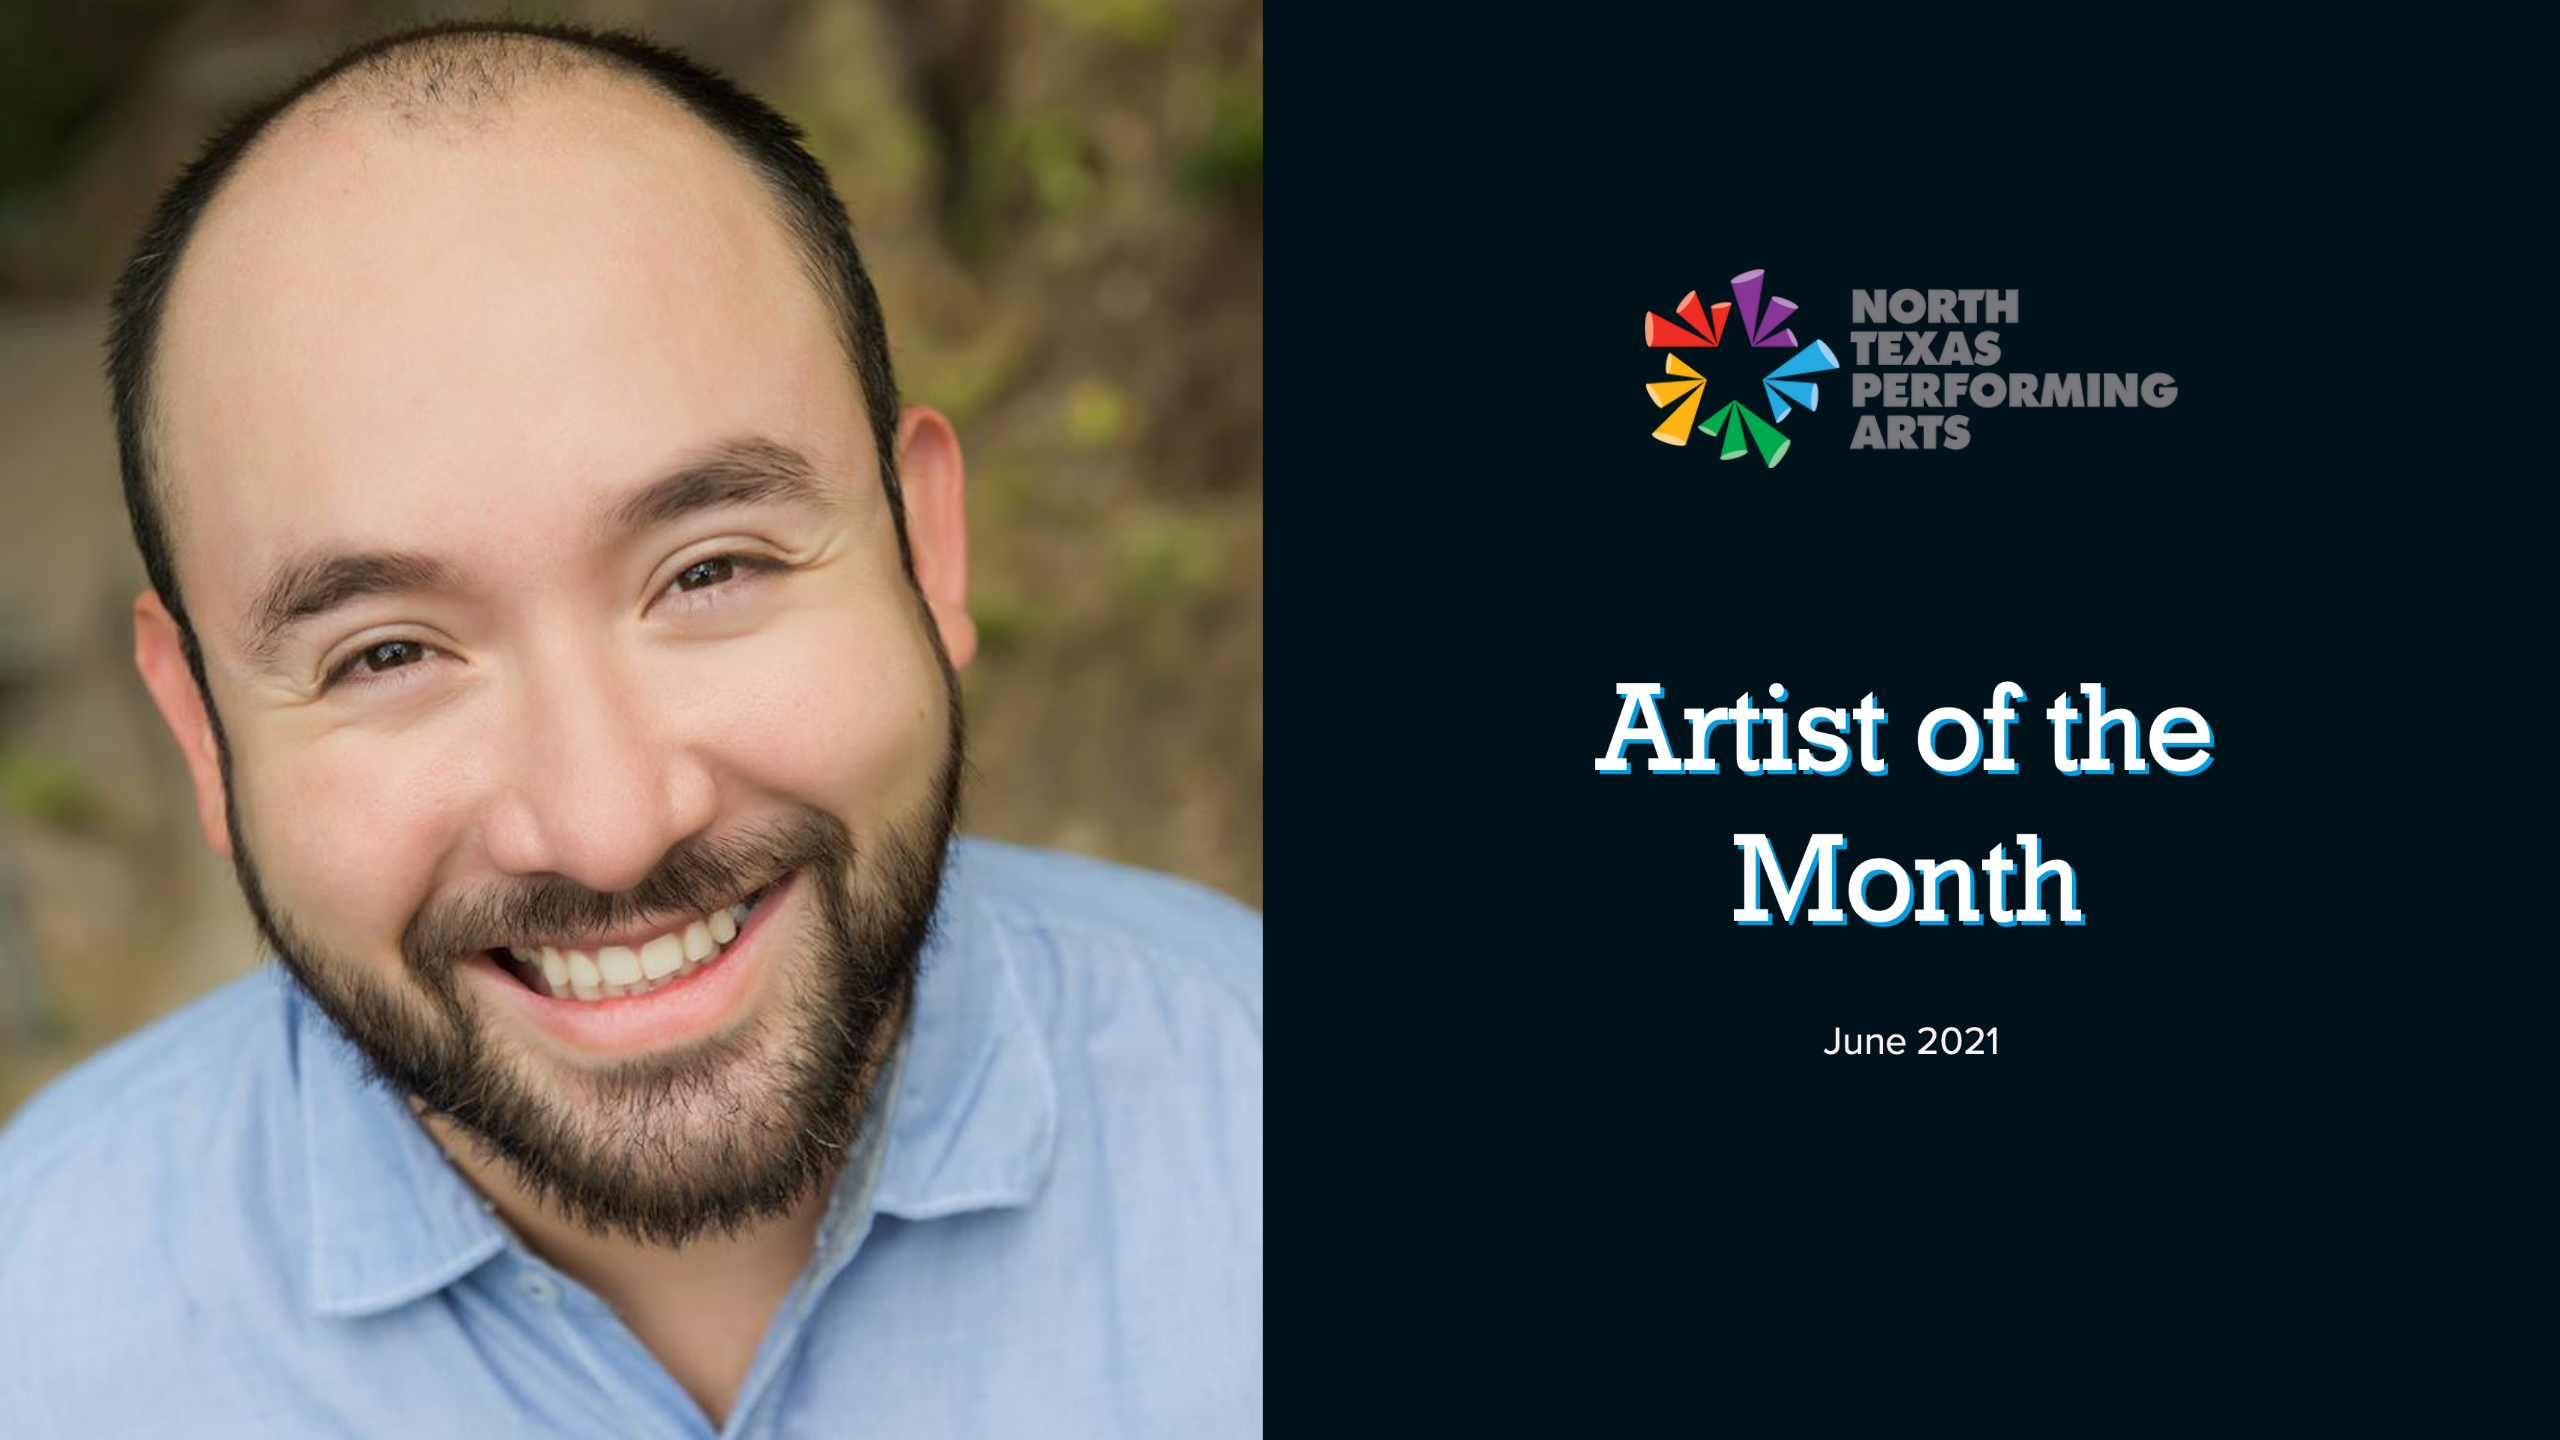 Jason Villarreal, Artist of the Month June 2021